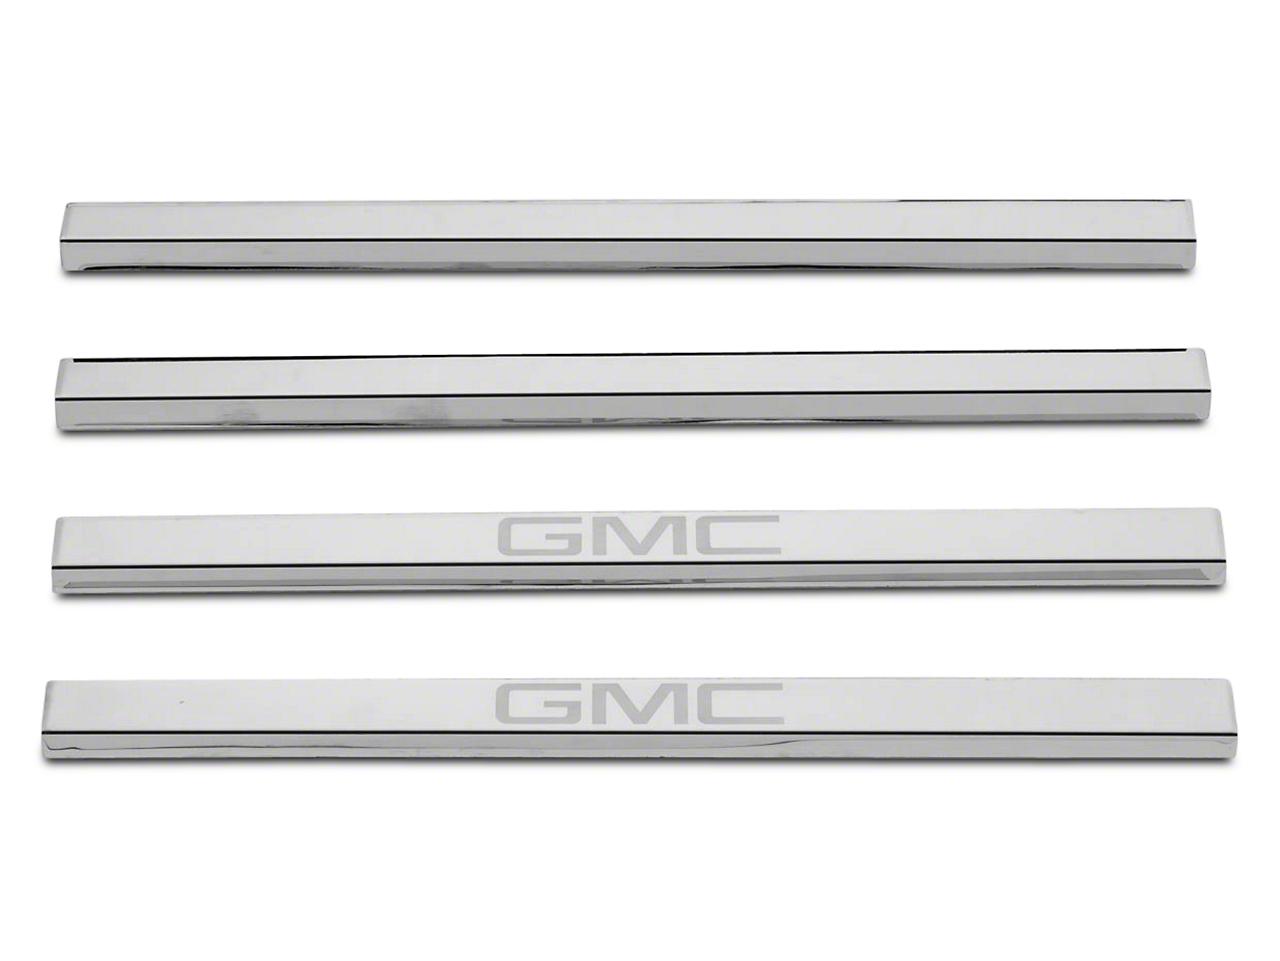 Putco Stainless Steel Door Sills w/ GMC Logo (14-18 Sierra 1500)